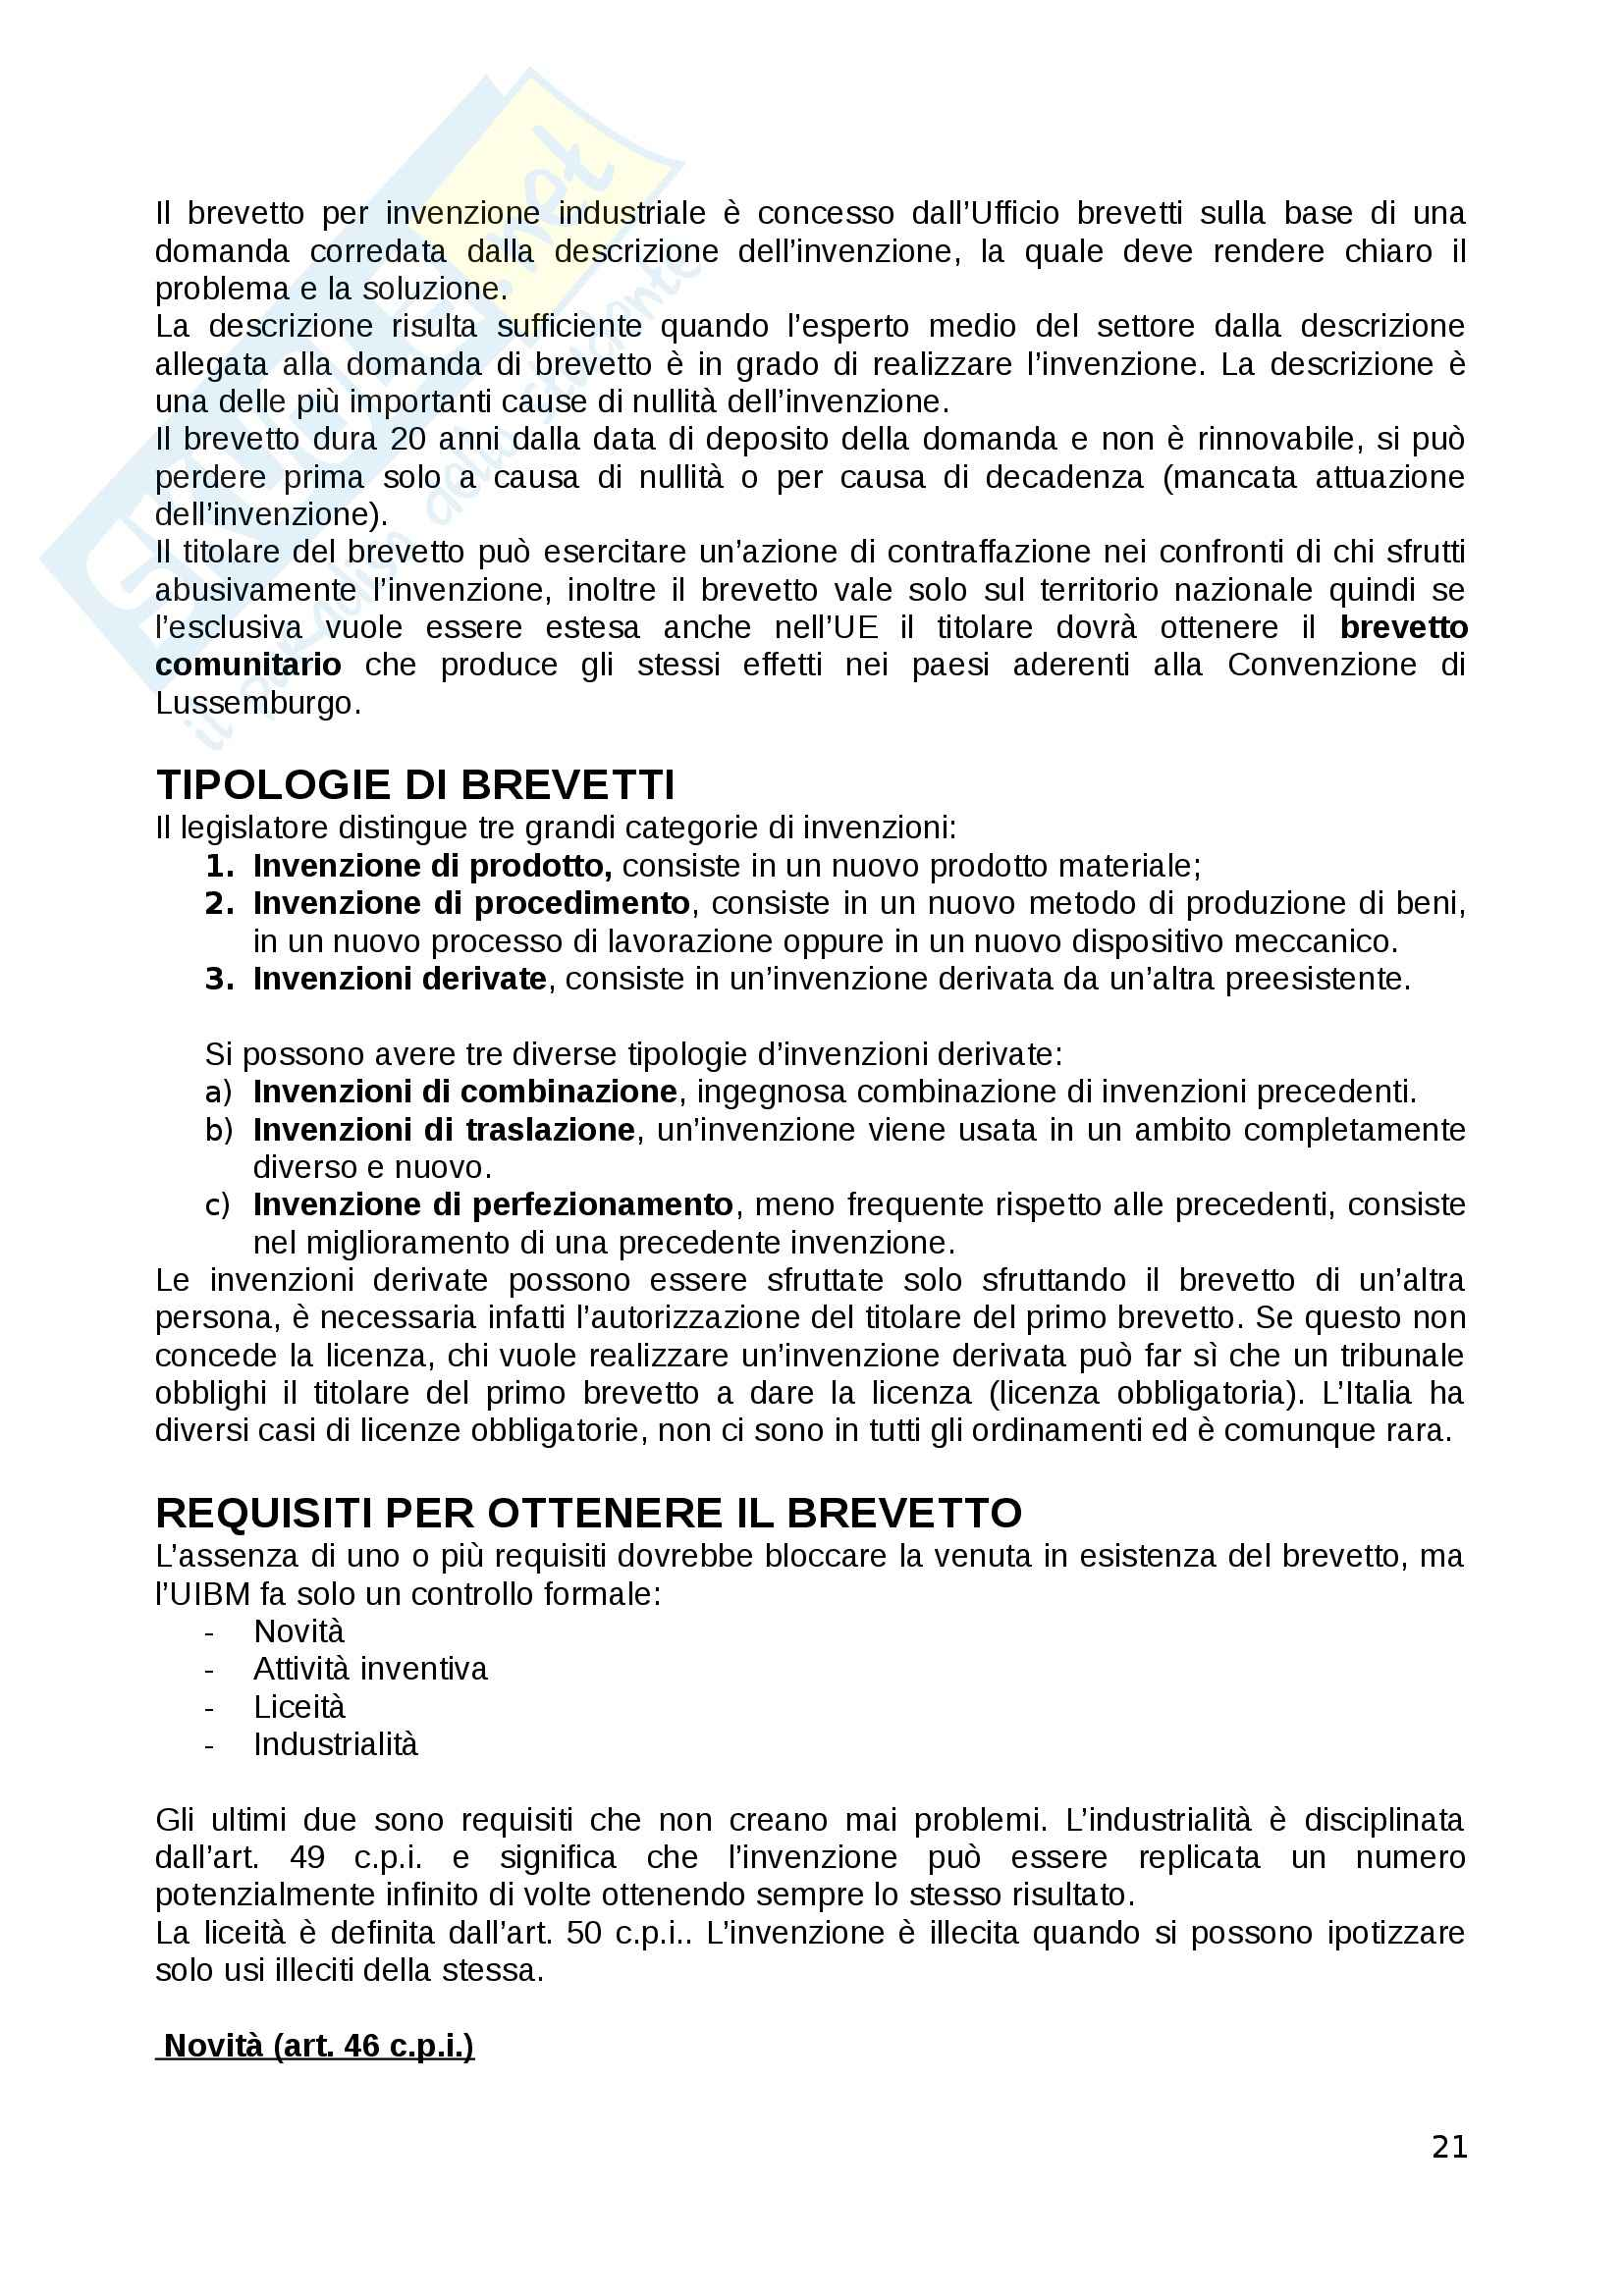 Diritto commerciale - Appunti Pag. 21